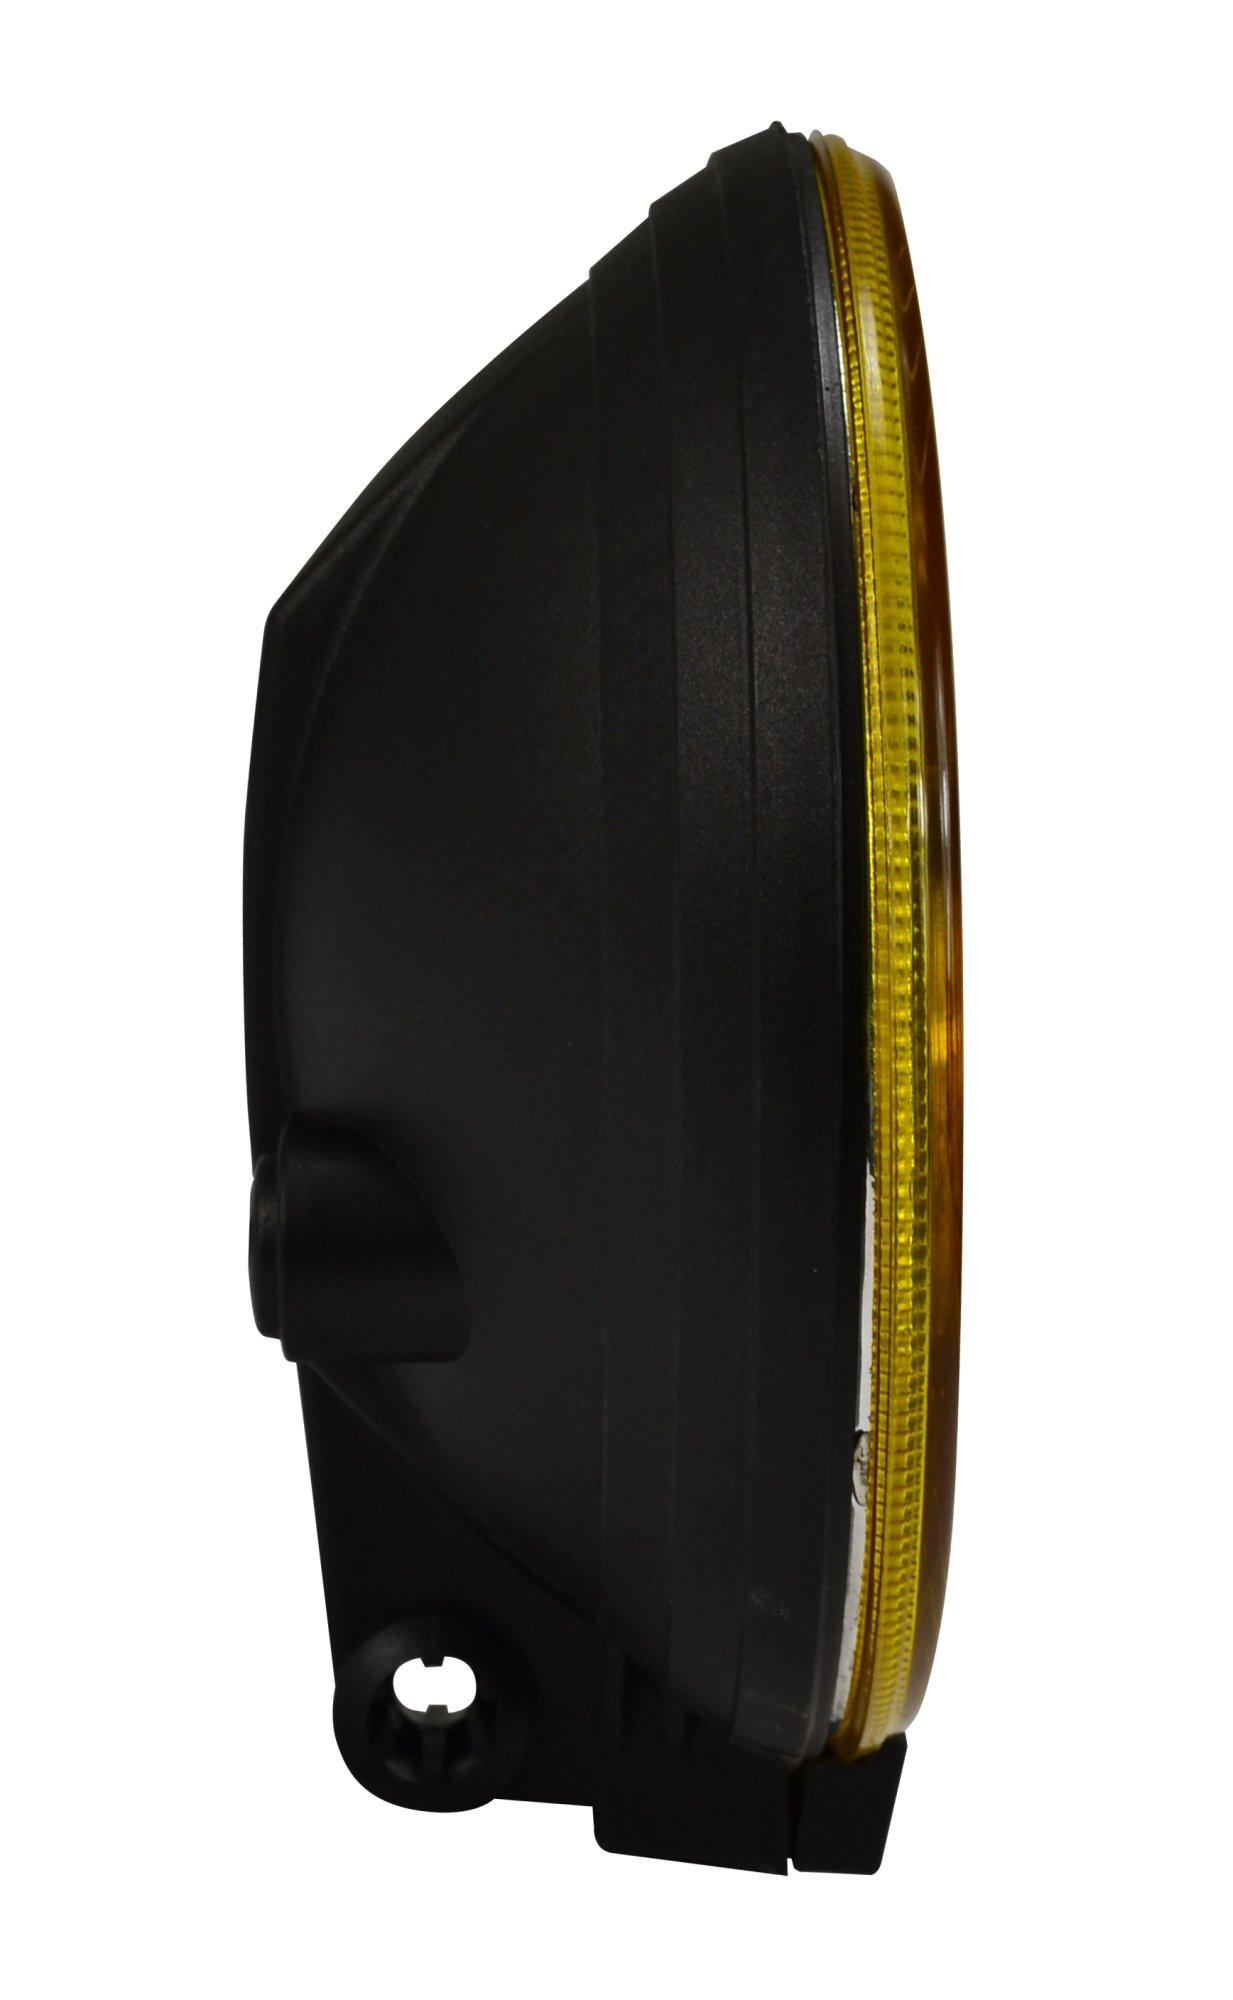 HELLA 005750512 500 Series Amber Driving Lamp (Single) by HELLA (Image #3)